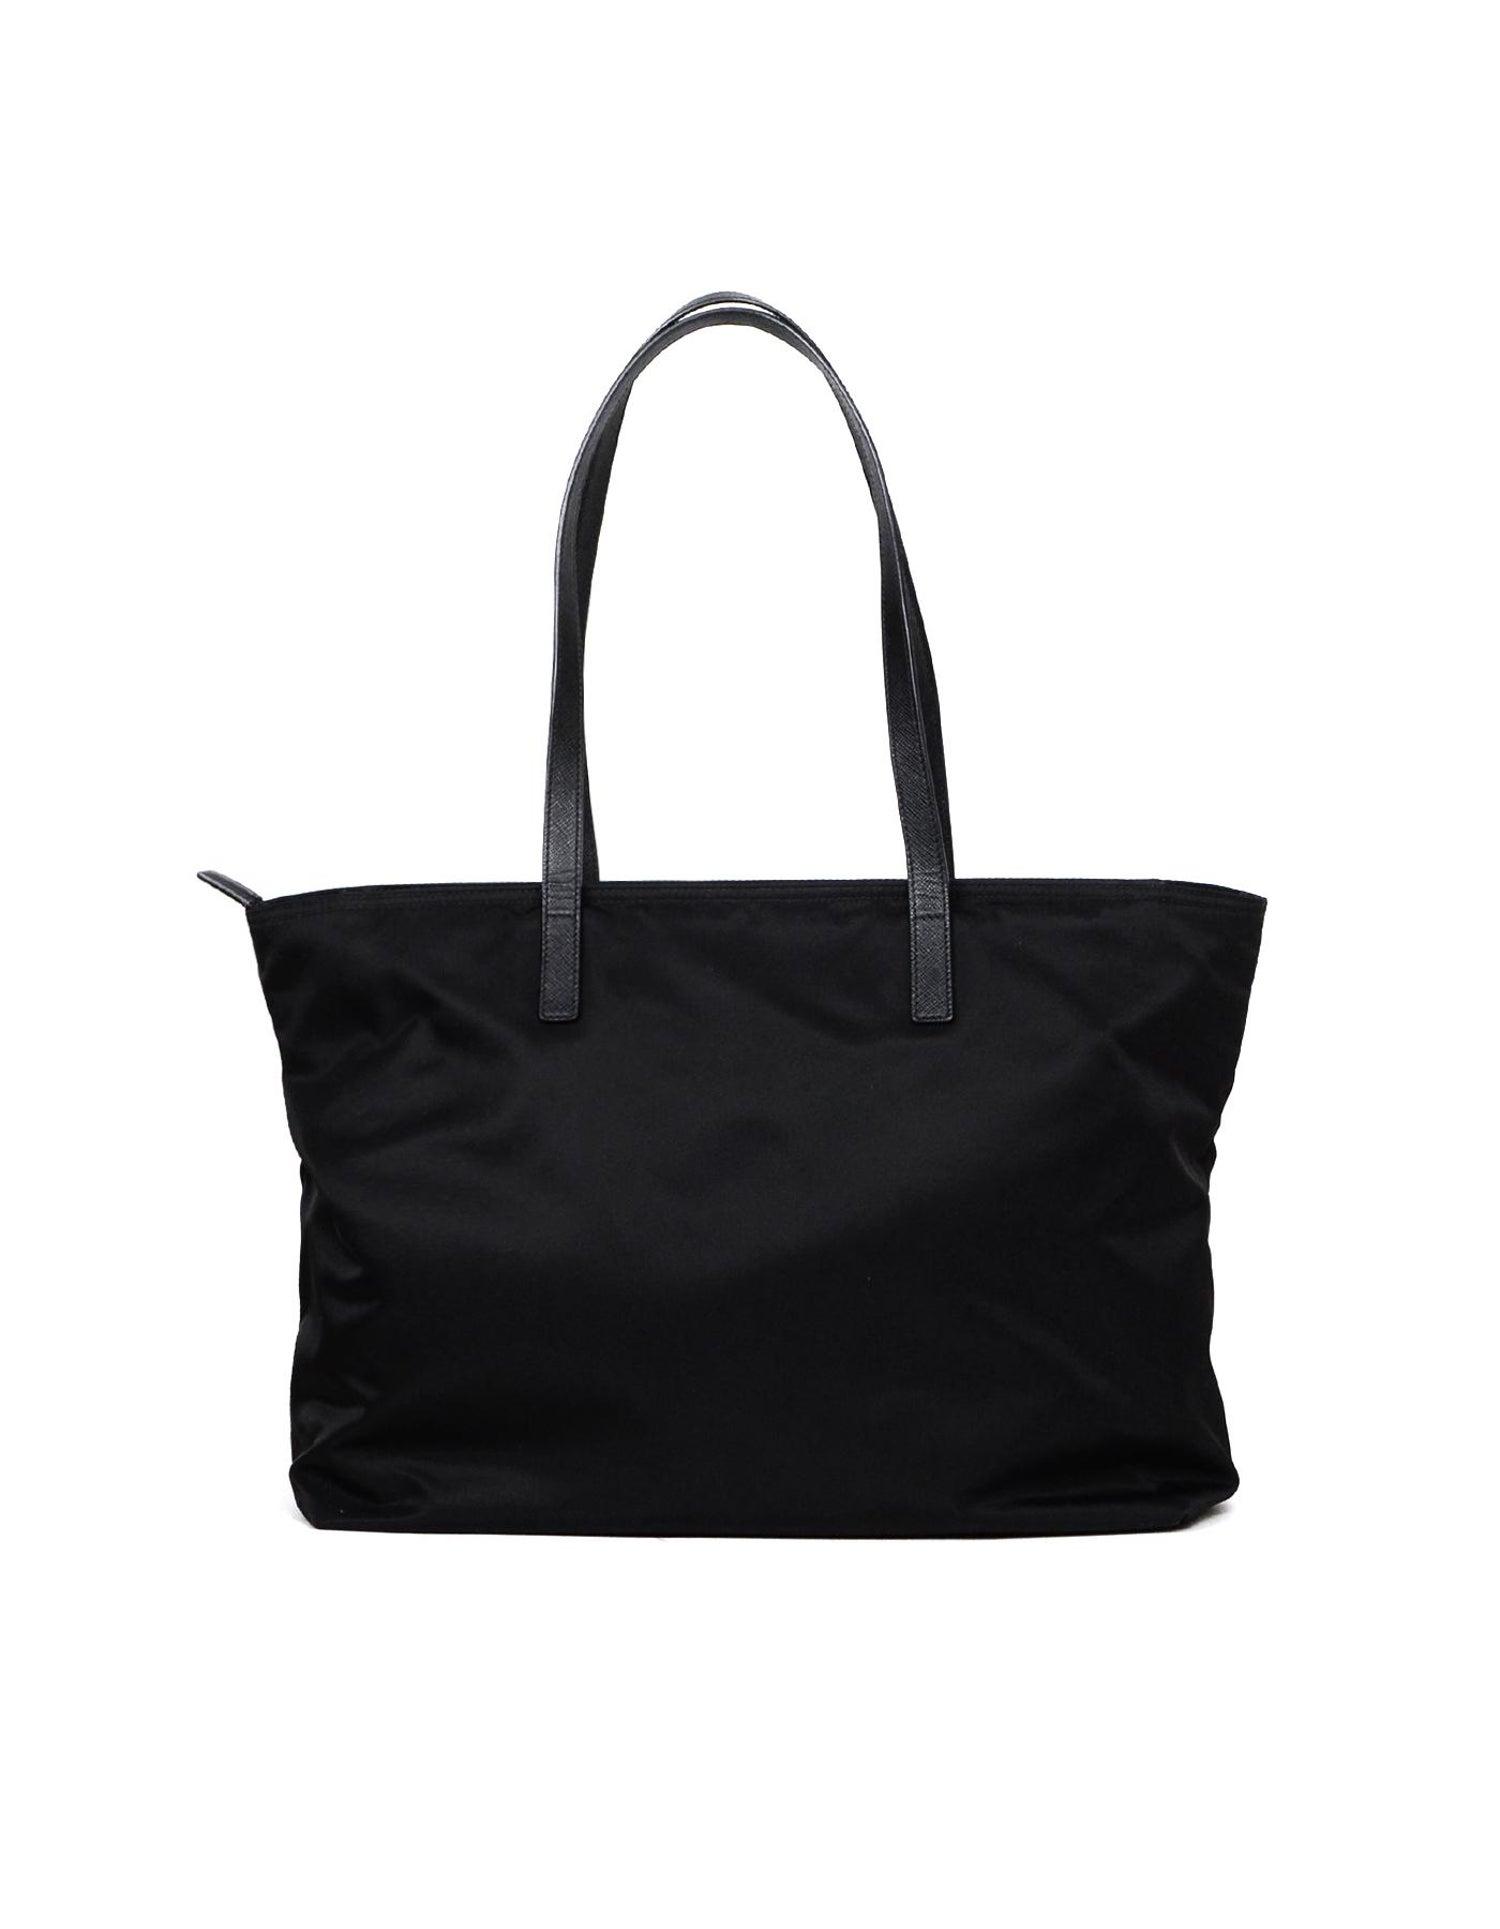 cdc77bba15d6 Prada 2018 Black Large Vela Nylon Tote Bag rt. $990 For Sale at 1stdibs